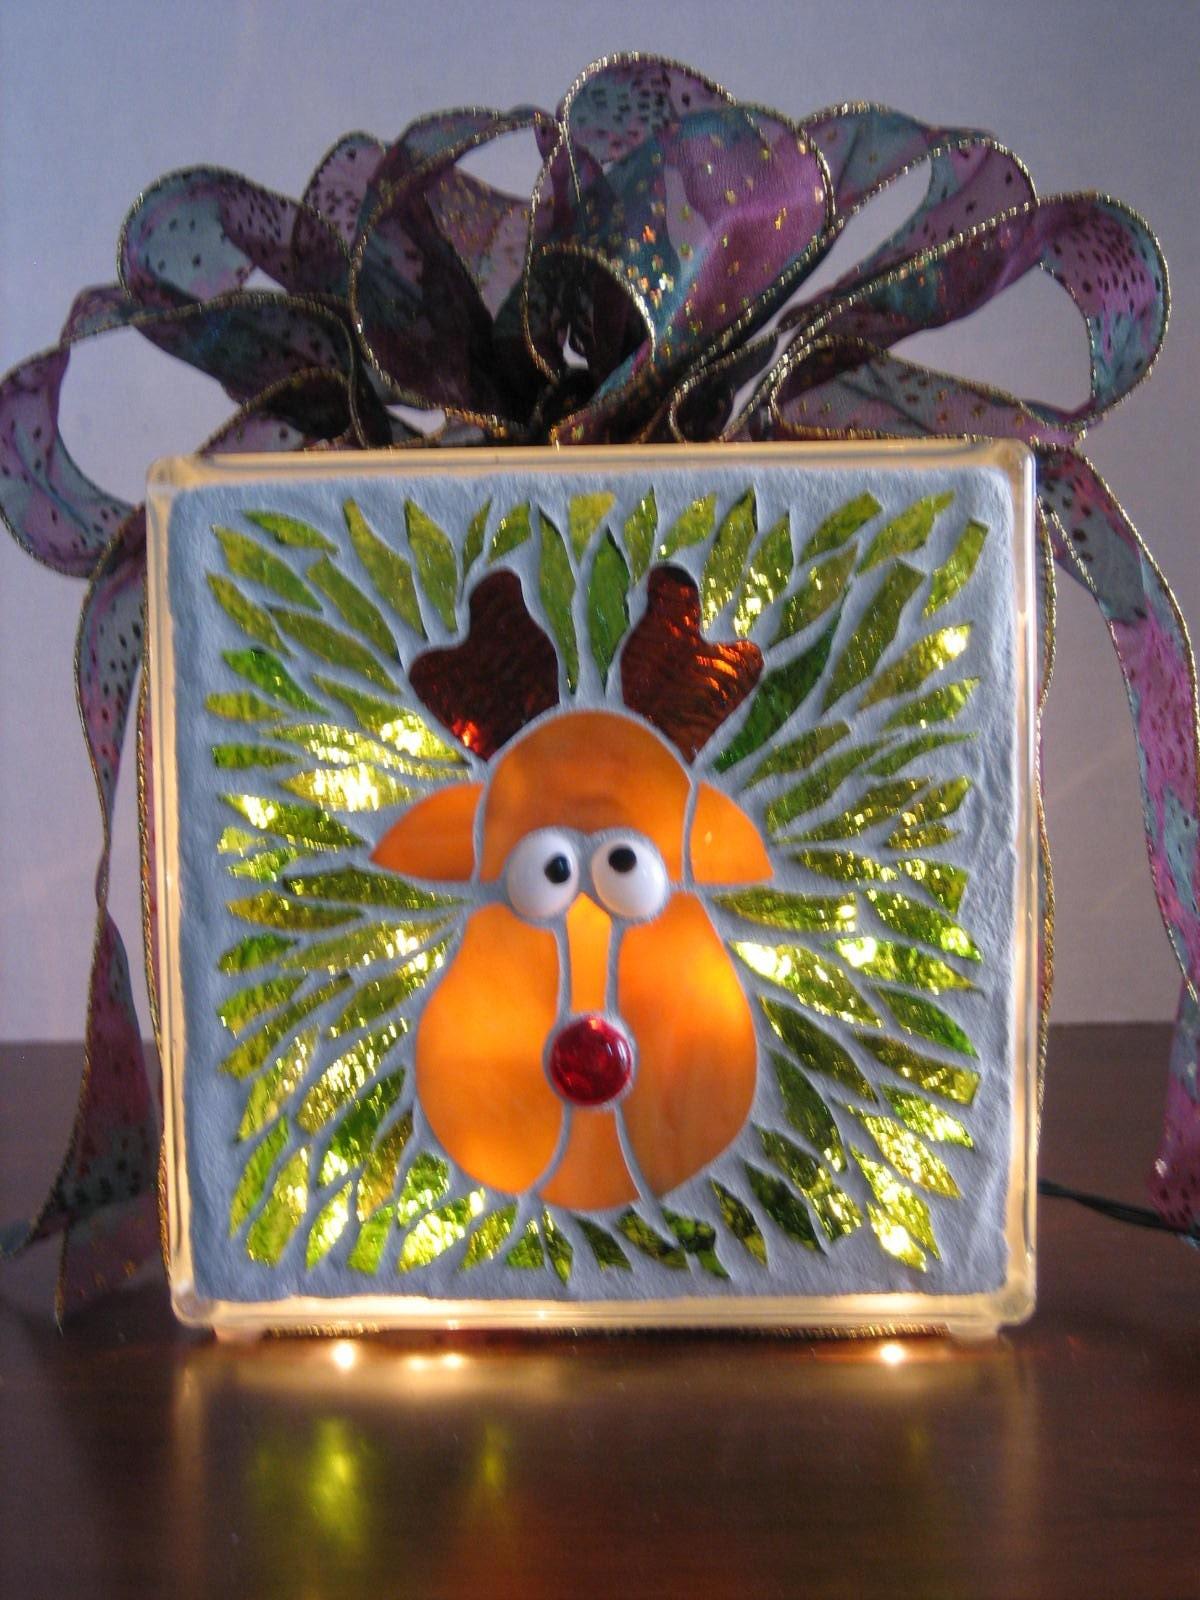 Rudy Reindeer Mosaic Lighted Glass Block